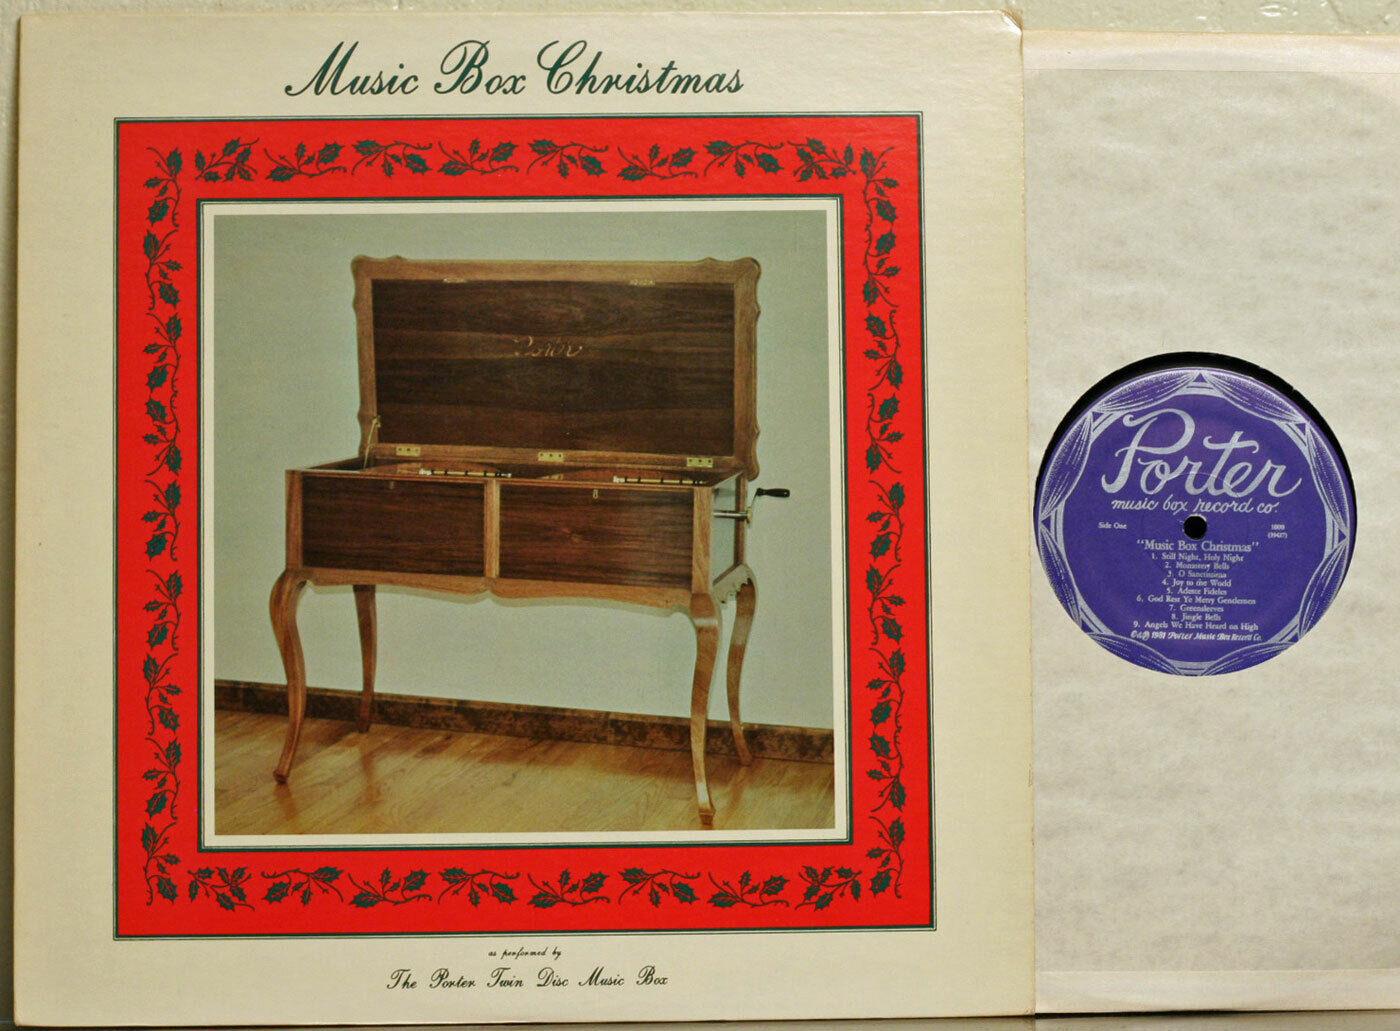 LP Music Box Christmas - Porter Twin Disc Music Box b3  - $7.50